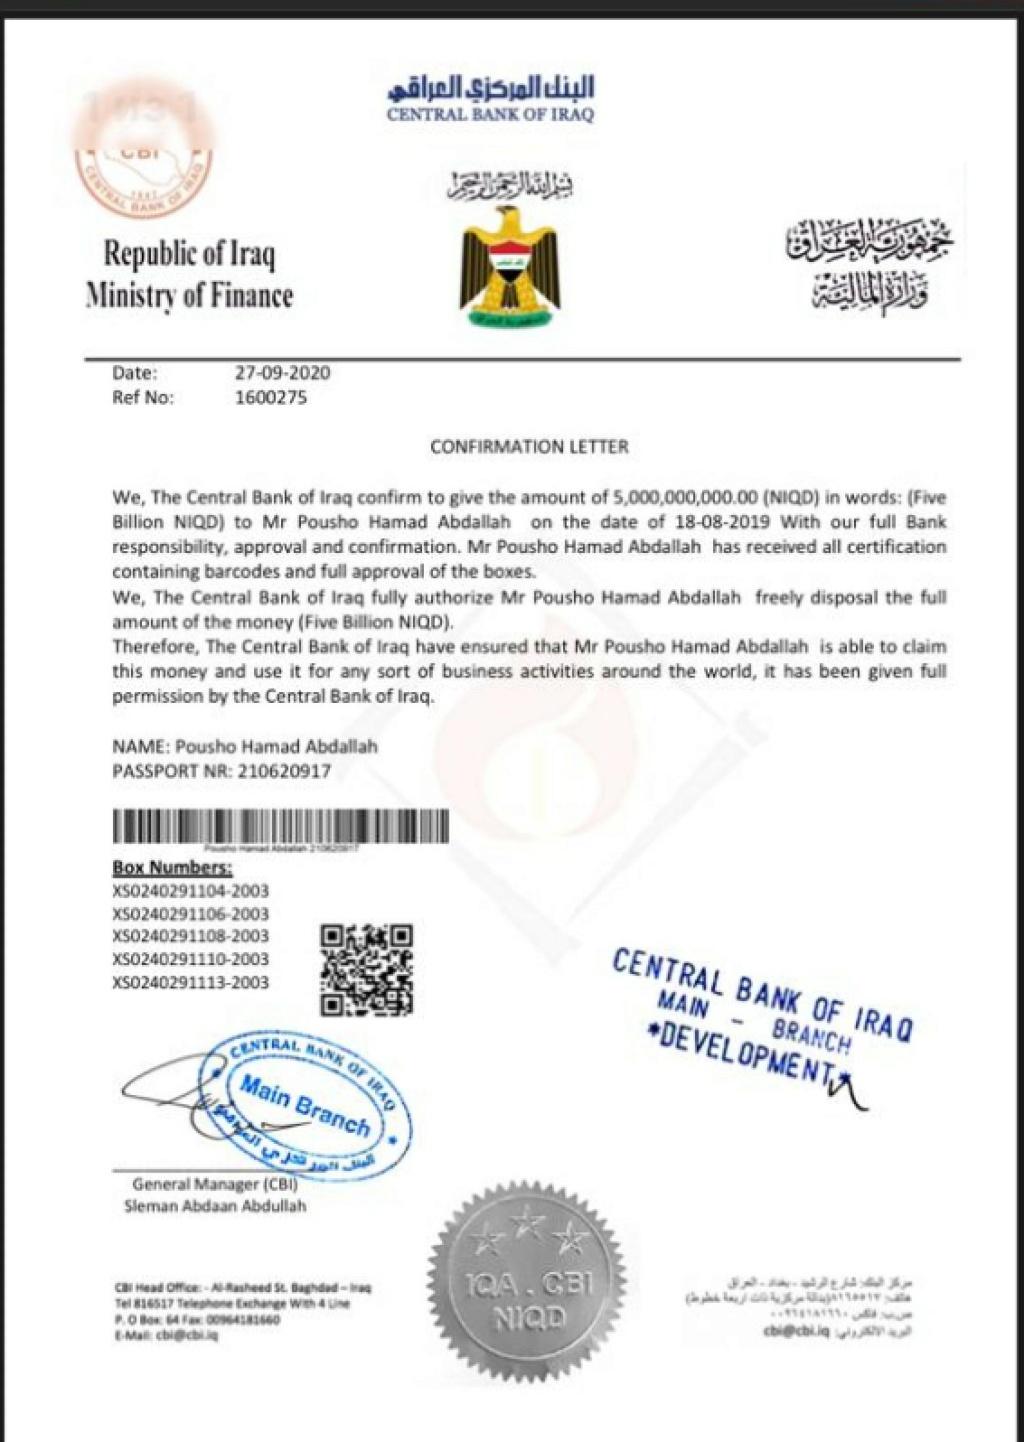 Super Petchili's, German Dawes and Young, Zimbabwe Notes - July 22, 2020 011110